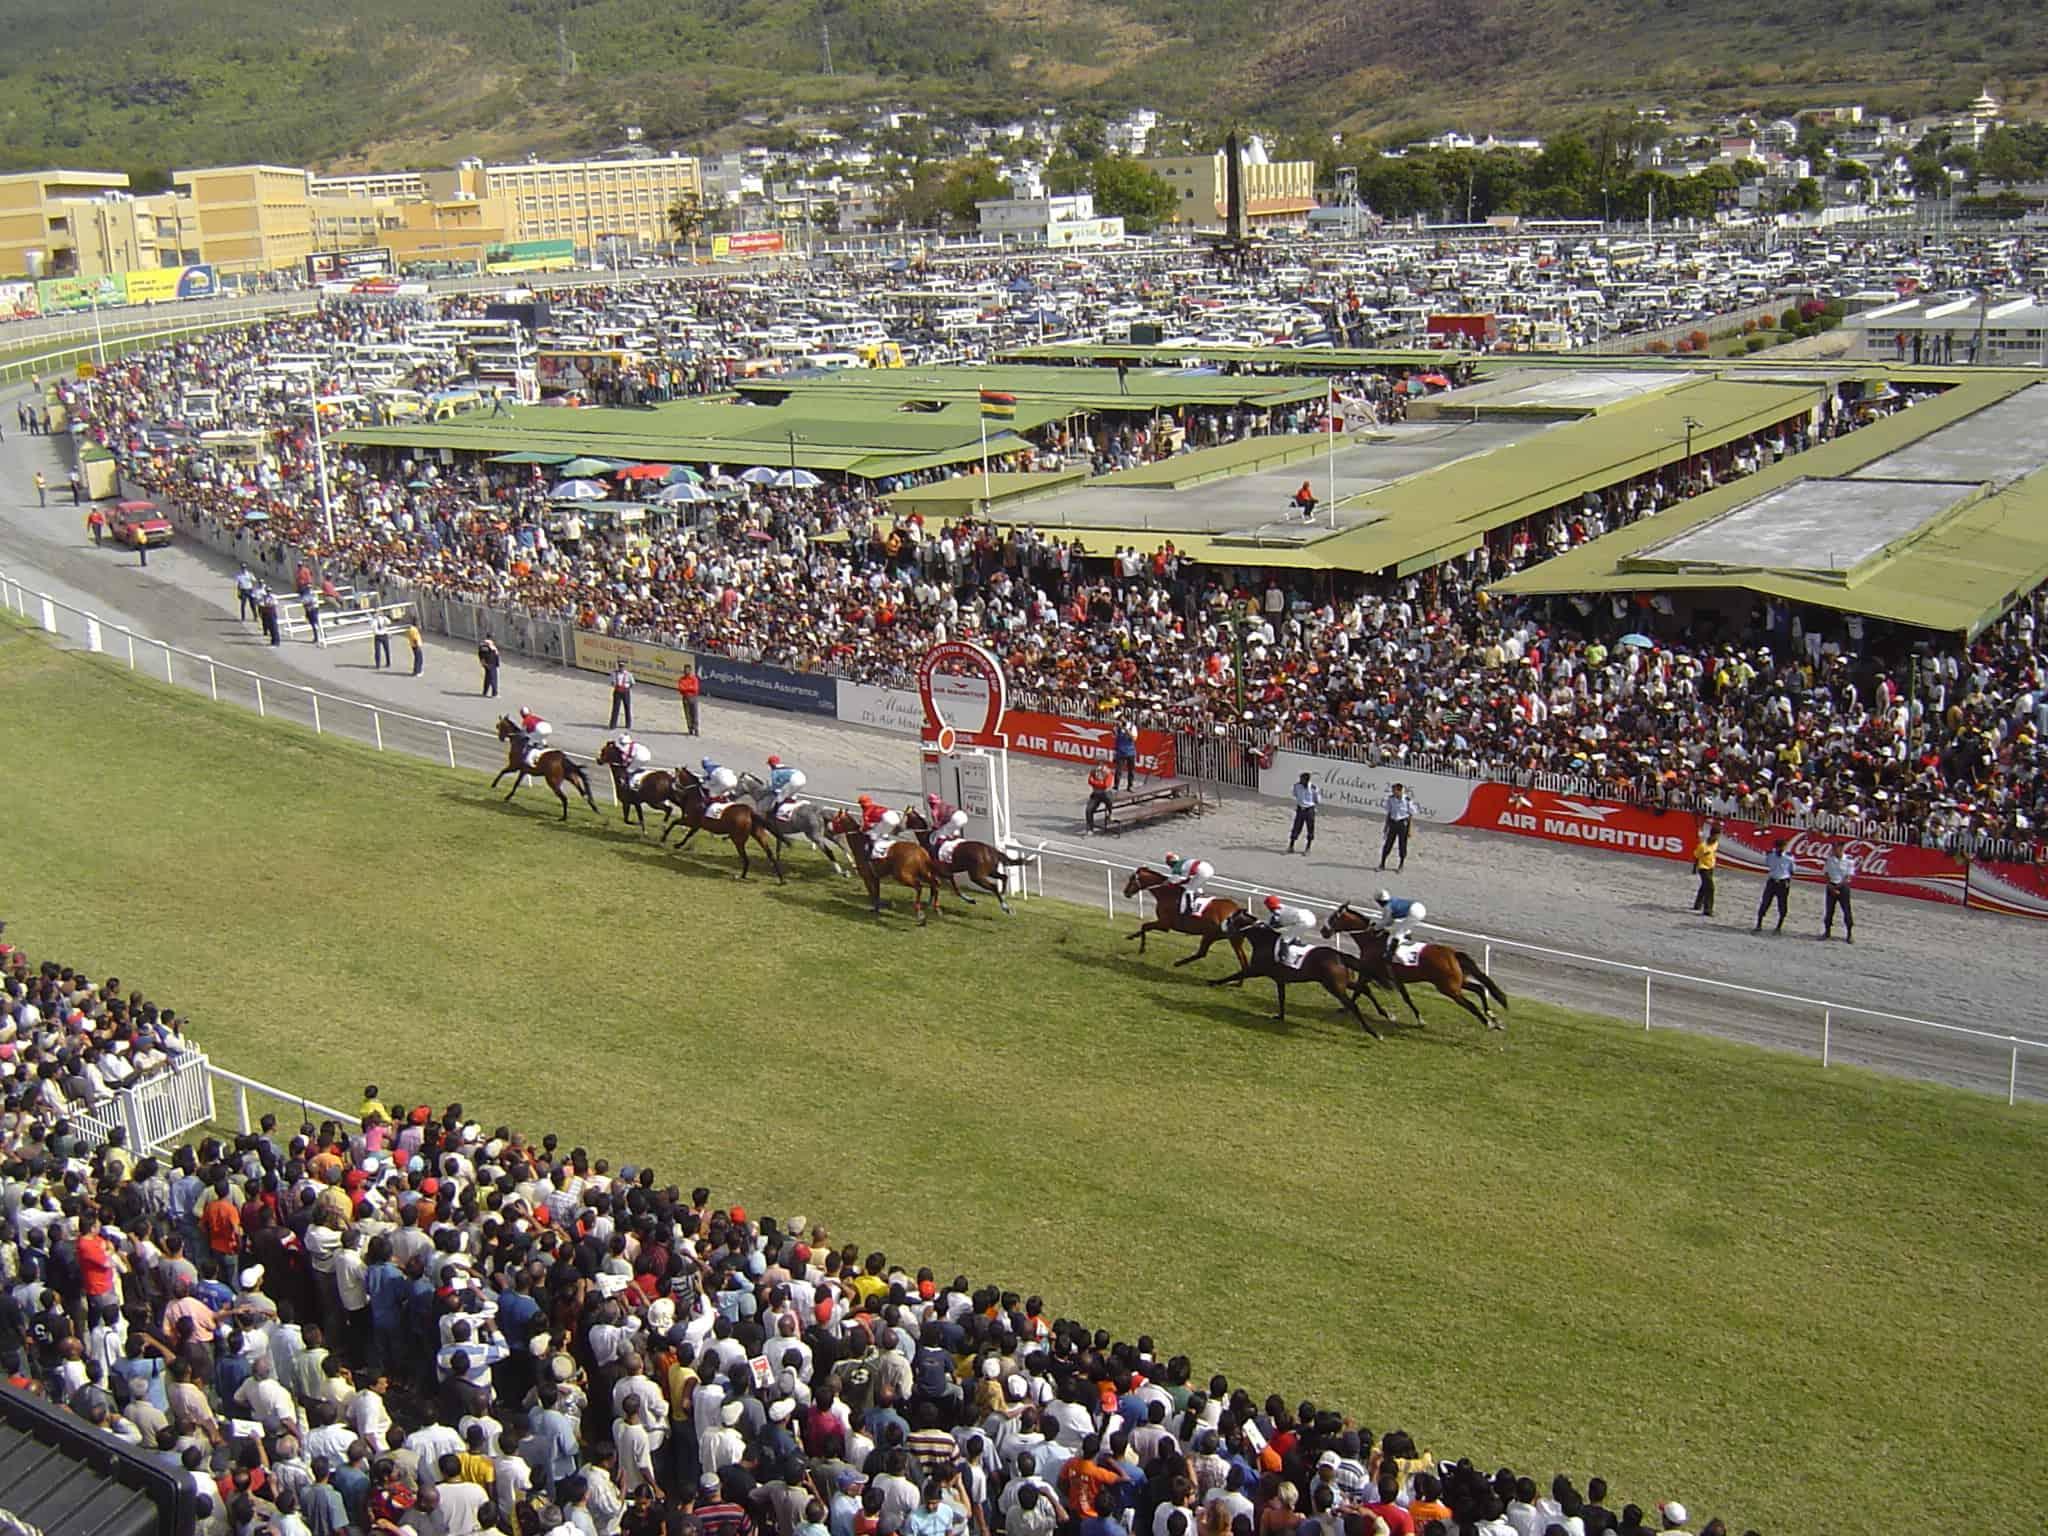 Champ de Mars Racecourse - Vacation Spots in Mauritius